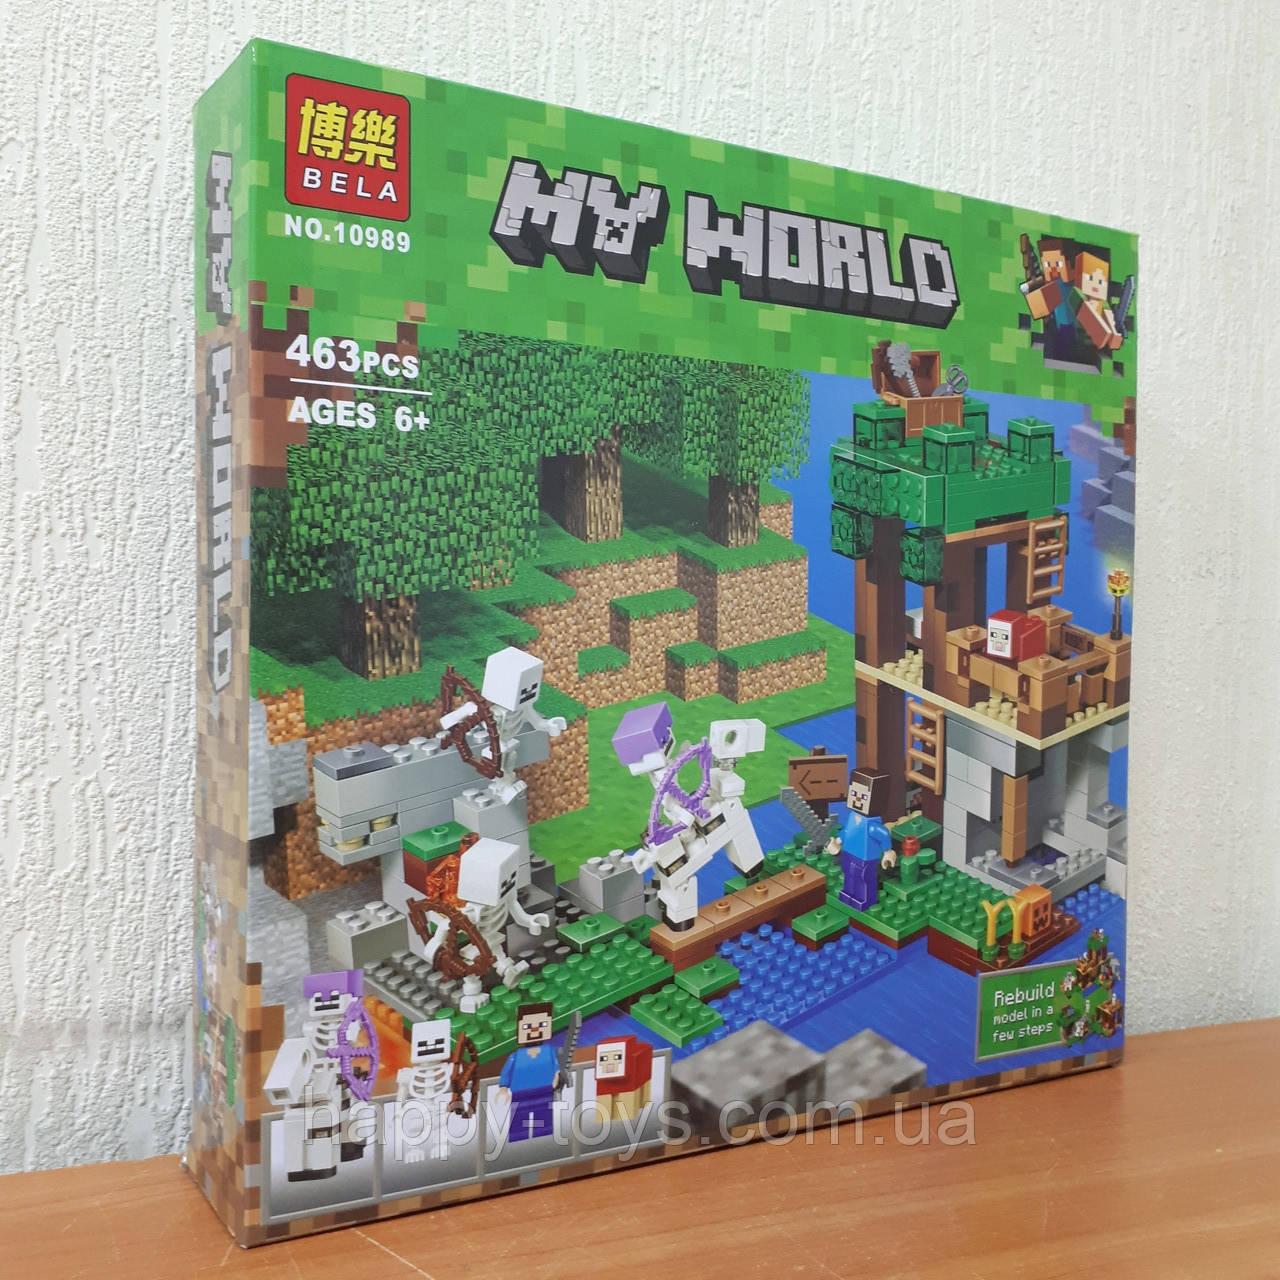 Конструктор Minecraft Bela 10989 Майнкрафт My World Нападение армии скелетов 463 детали